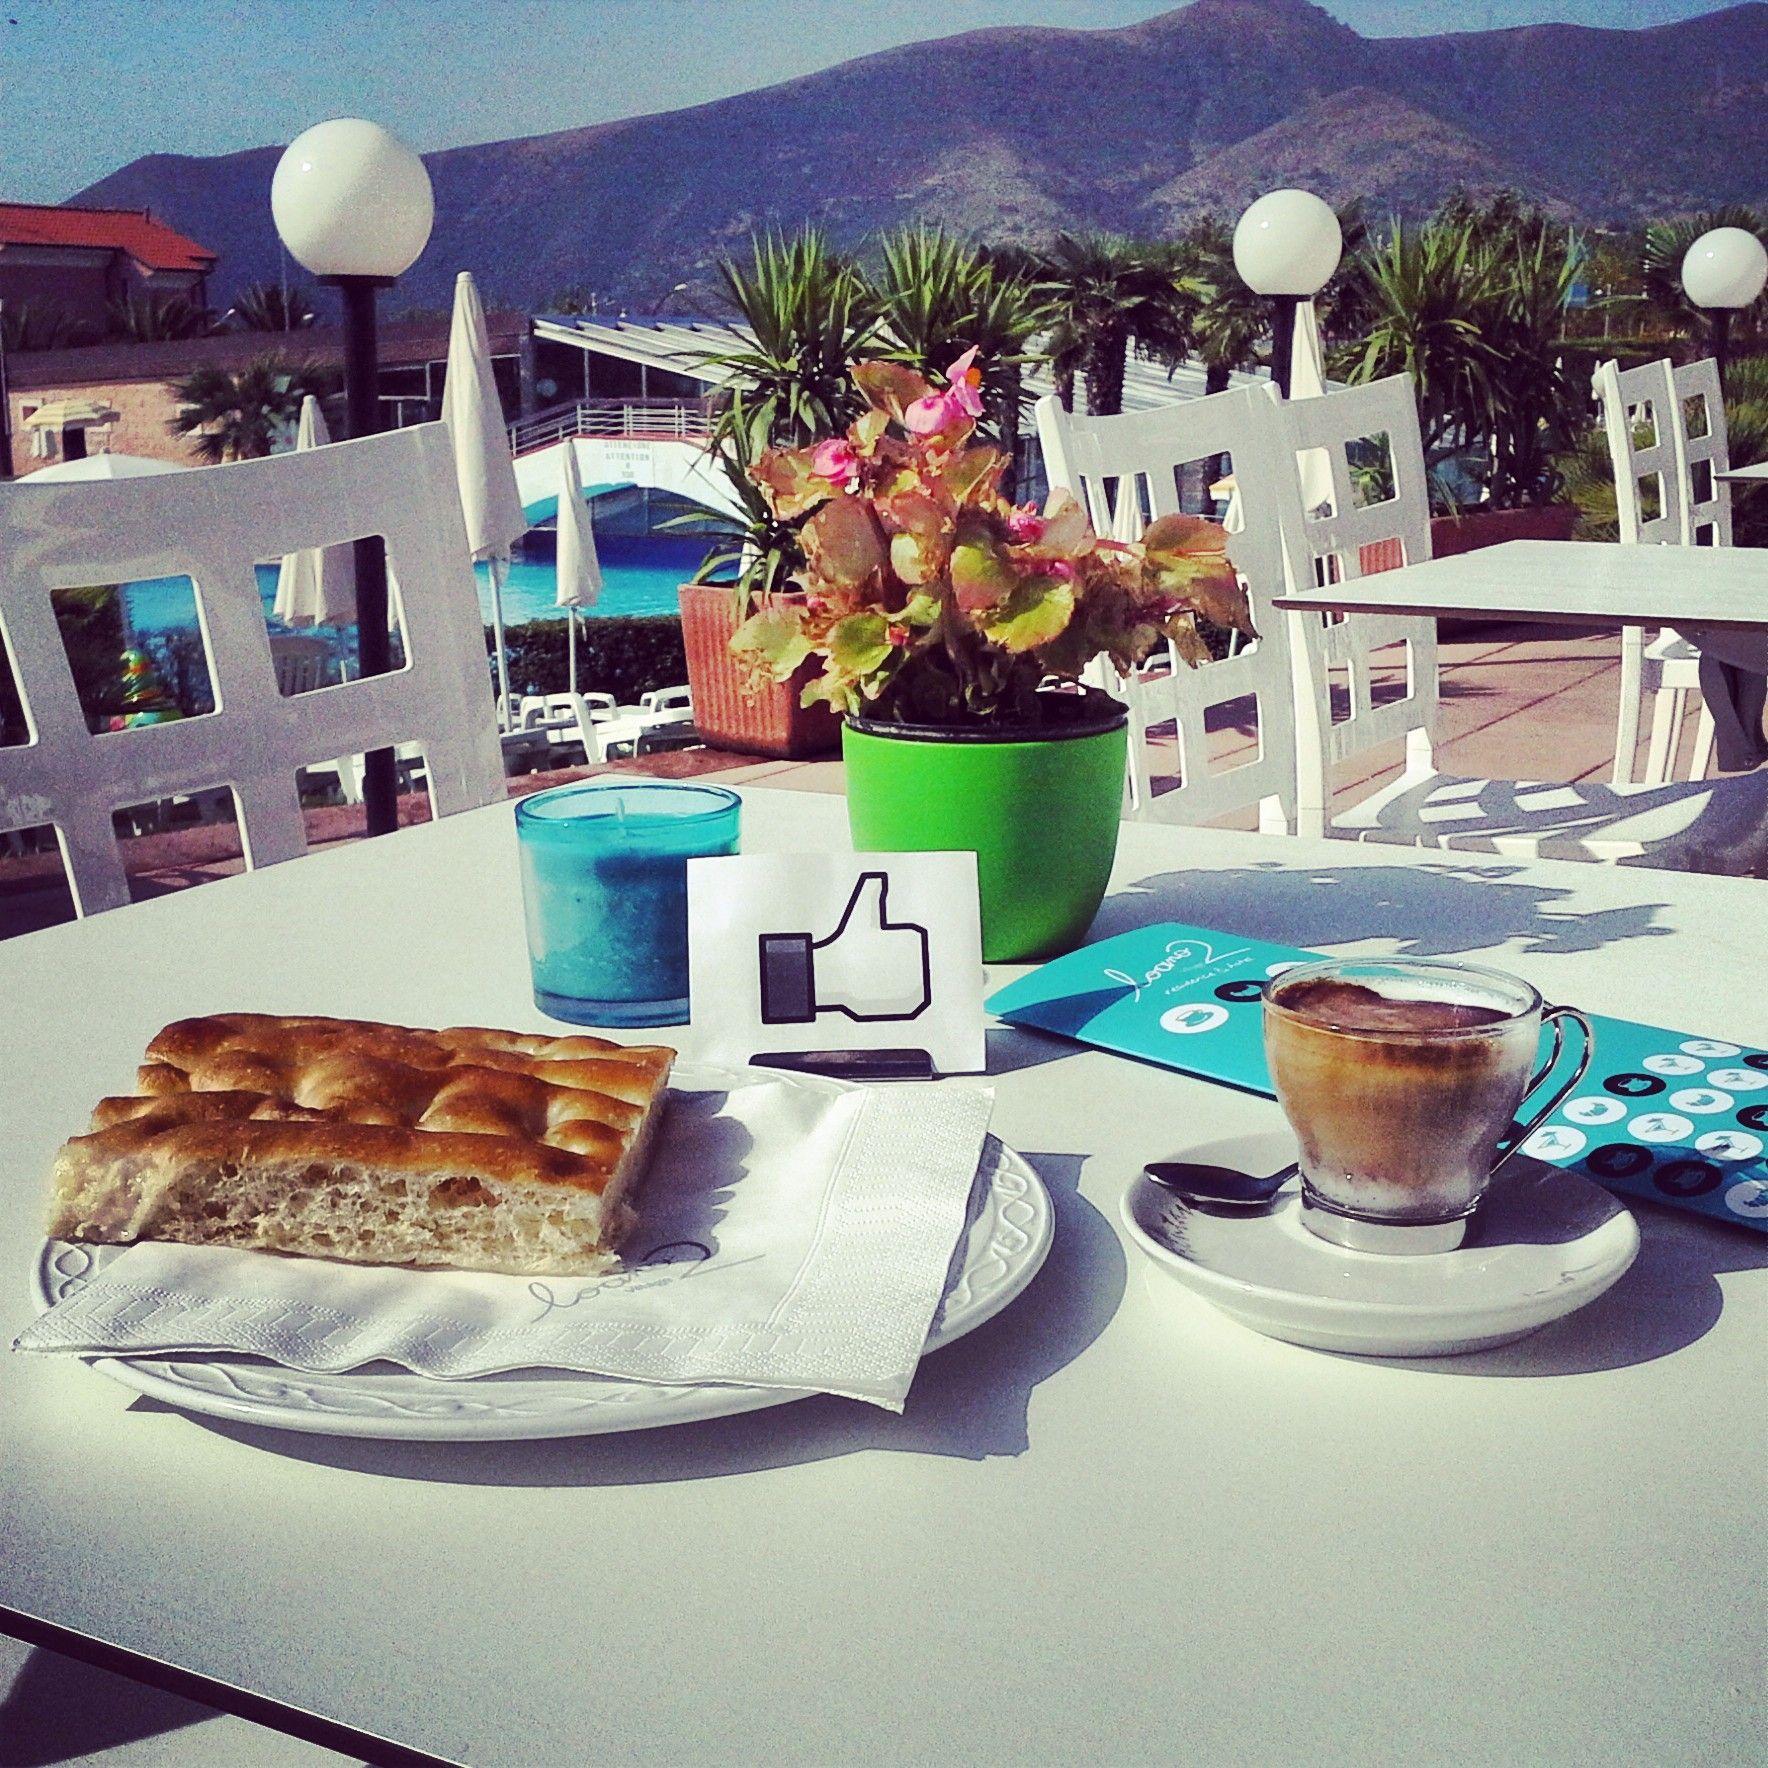 #breakfast at #bar Bikini #goodday #loano2village #resort #bluesky #love #sunny #goodmorning #buongiorno Ligurian #focaccia & #coffee #pools